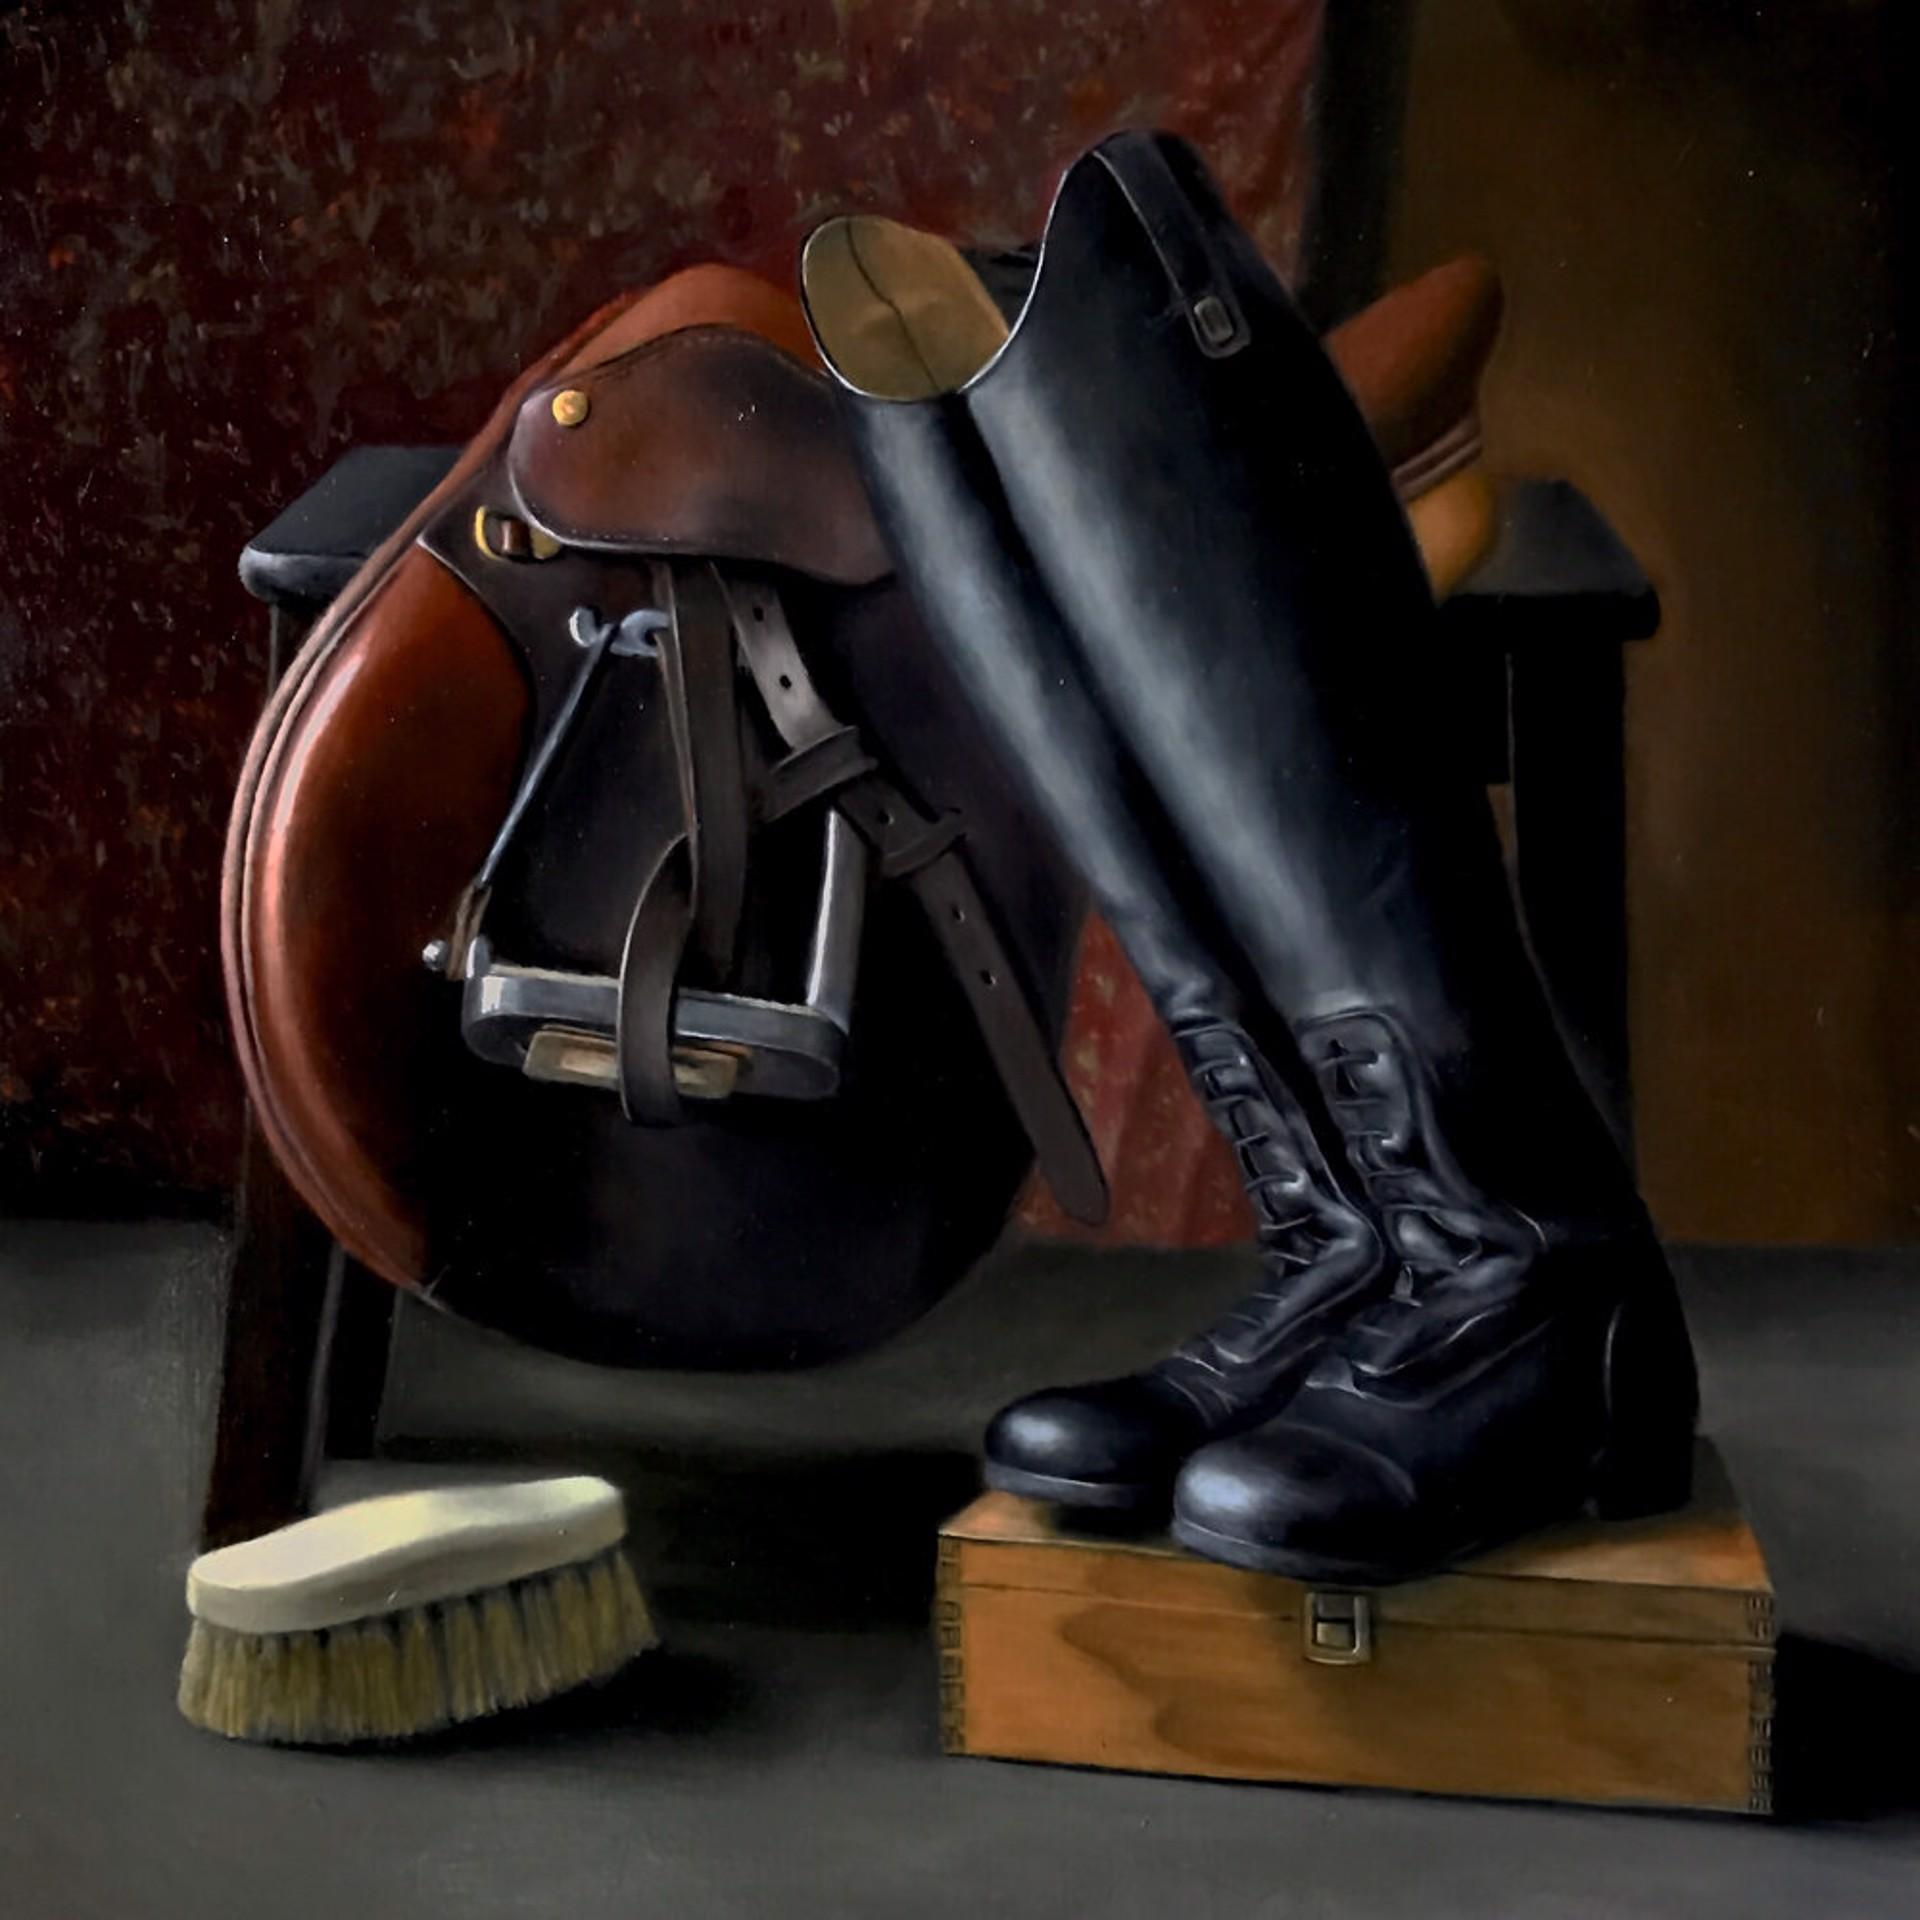 Equestrian Attributes by Claire Taveras